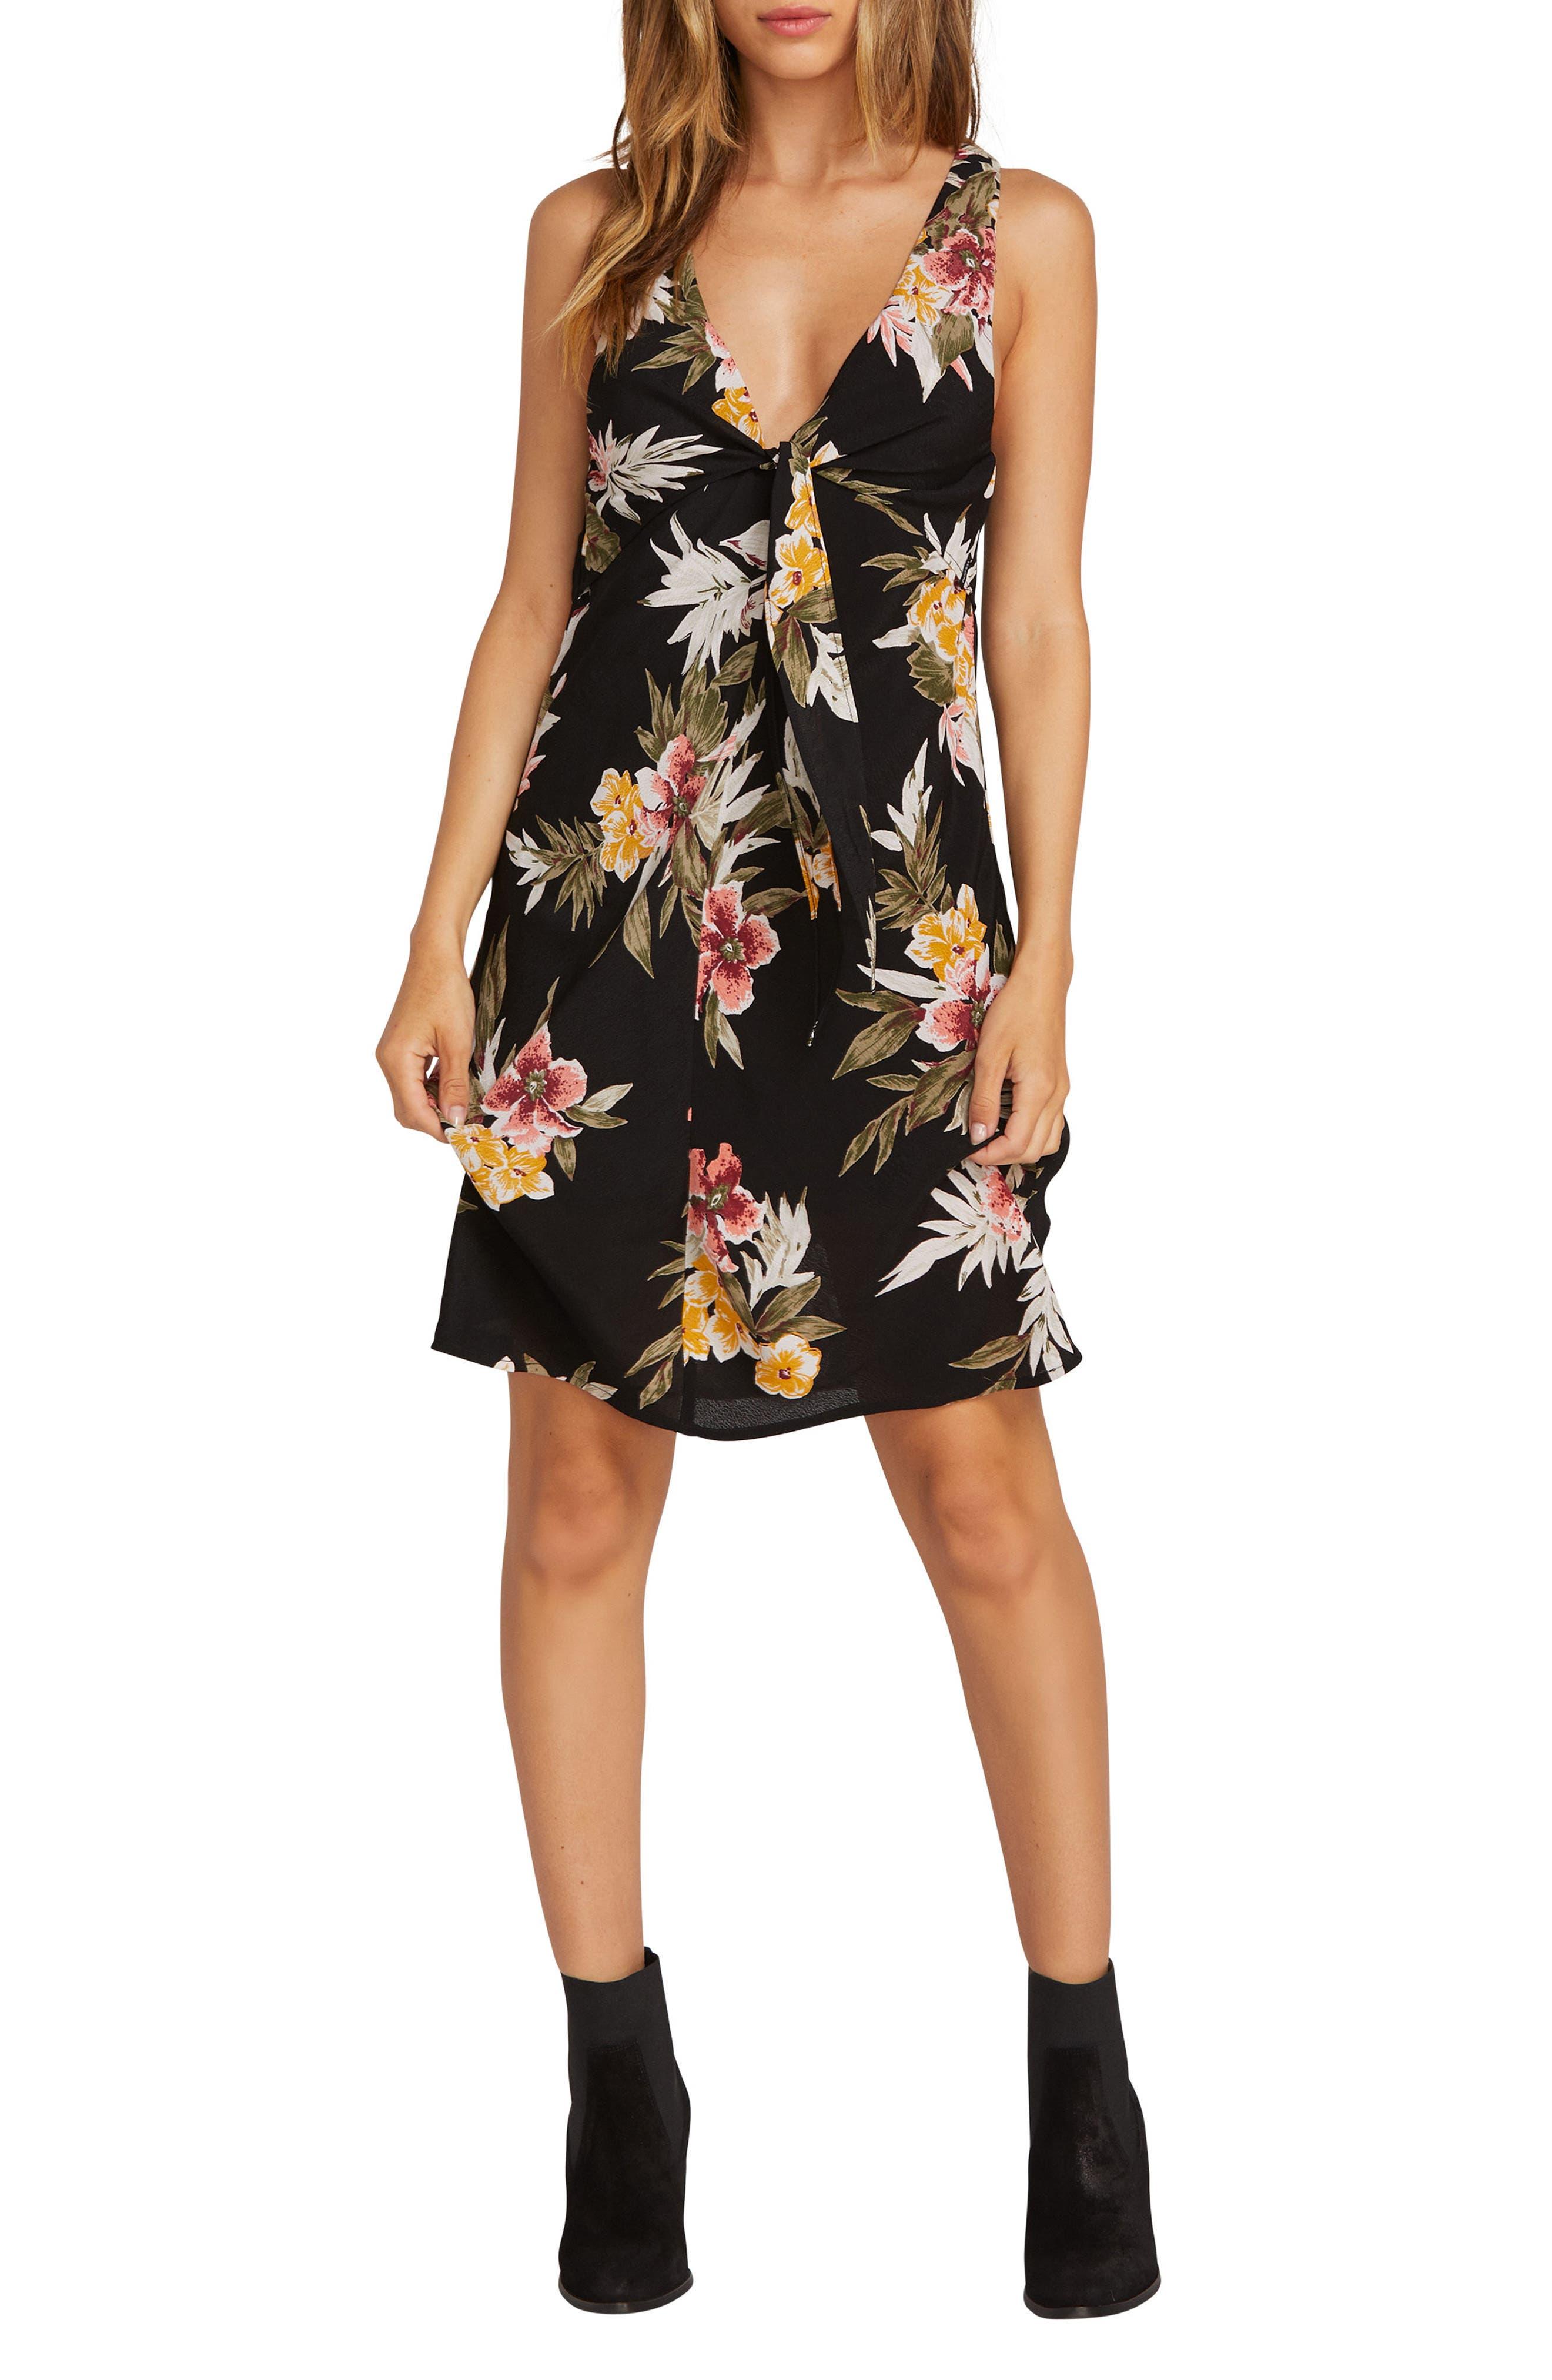 Volcom Wrap Skillz Floral Print Dress, Black